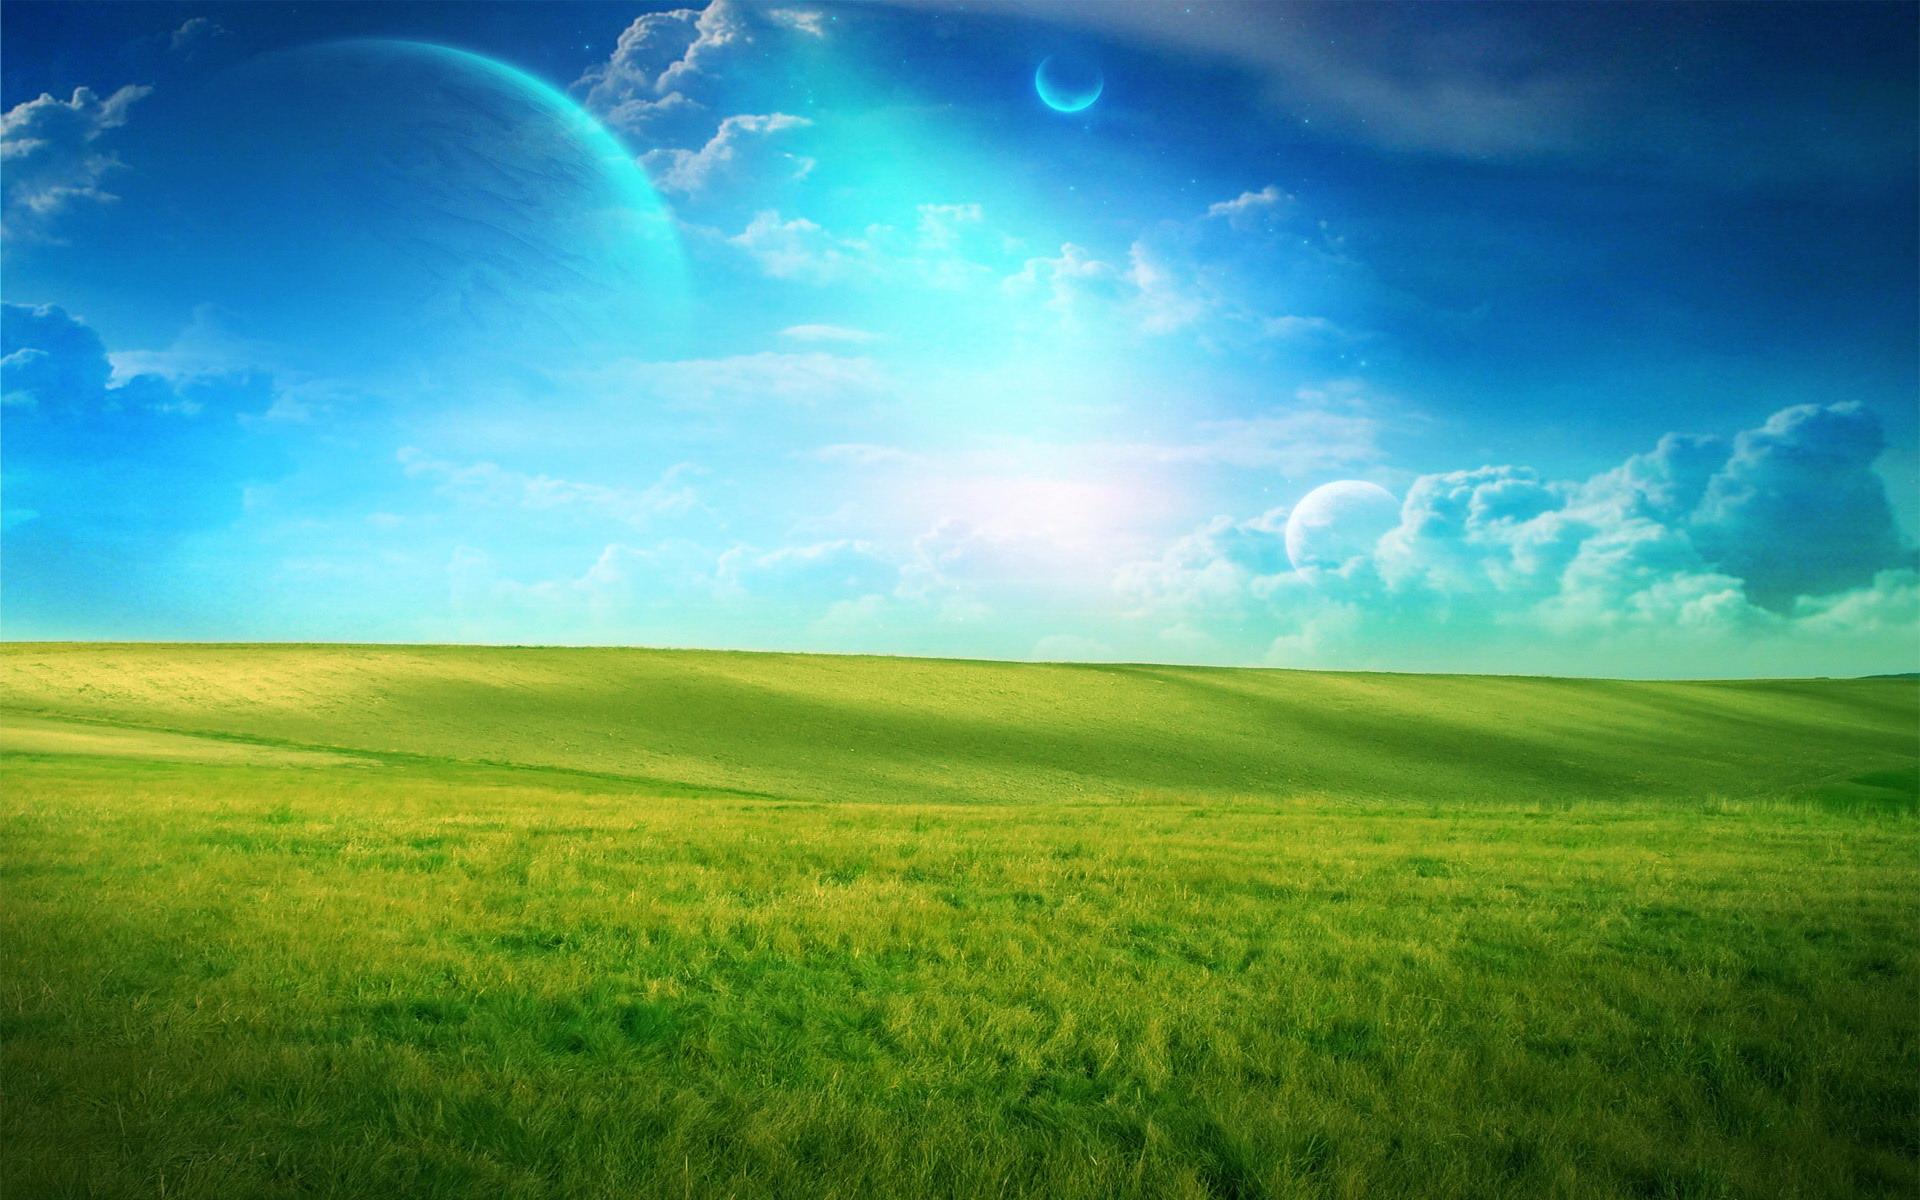 Dreamland8849412785 - Dreamland - Dreamscape, Dreamland